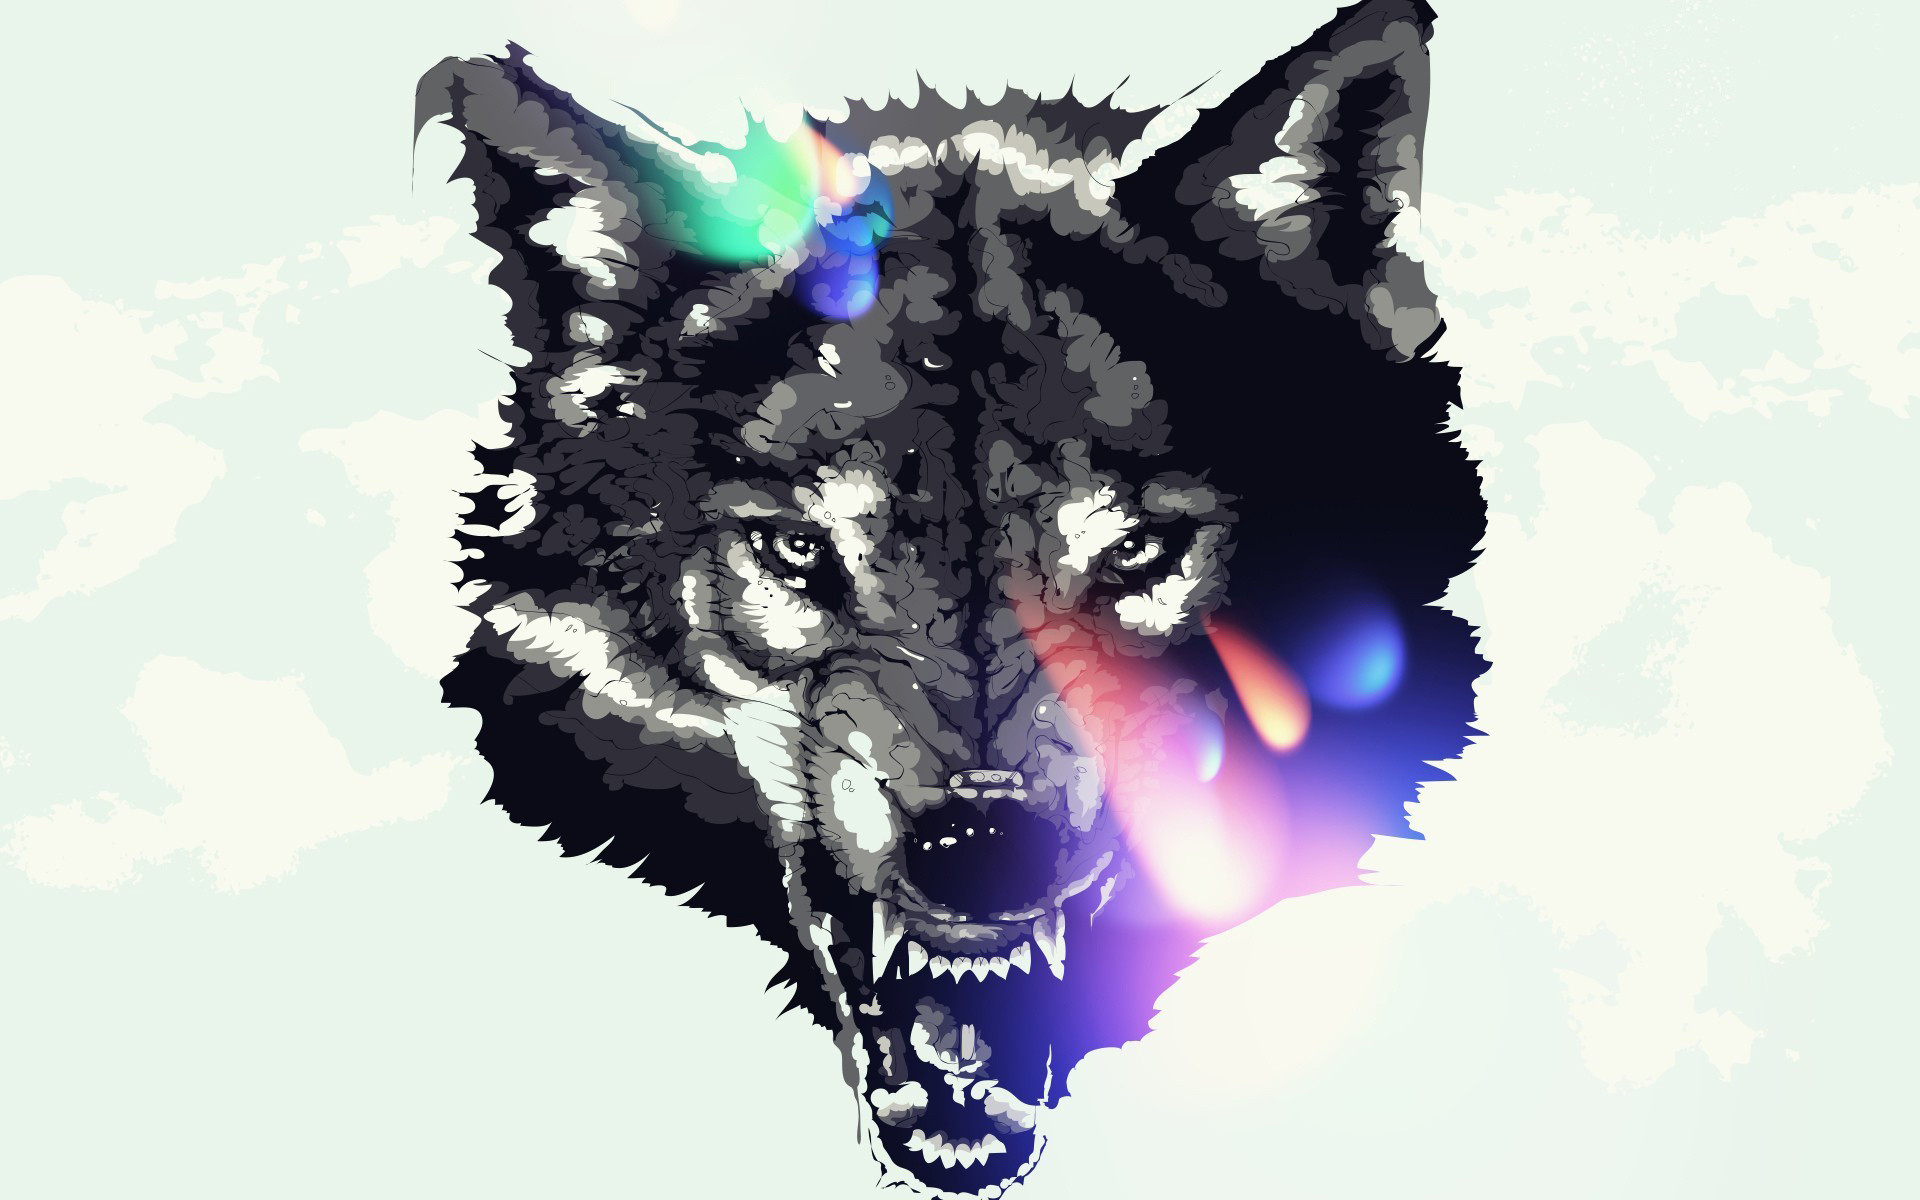 Wolf art wallpaper 79 images - Anime wolf wallpaper ...